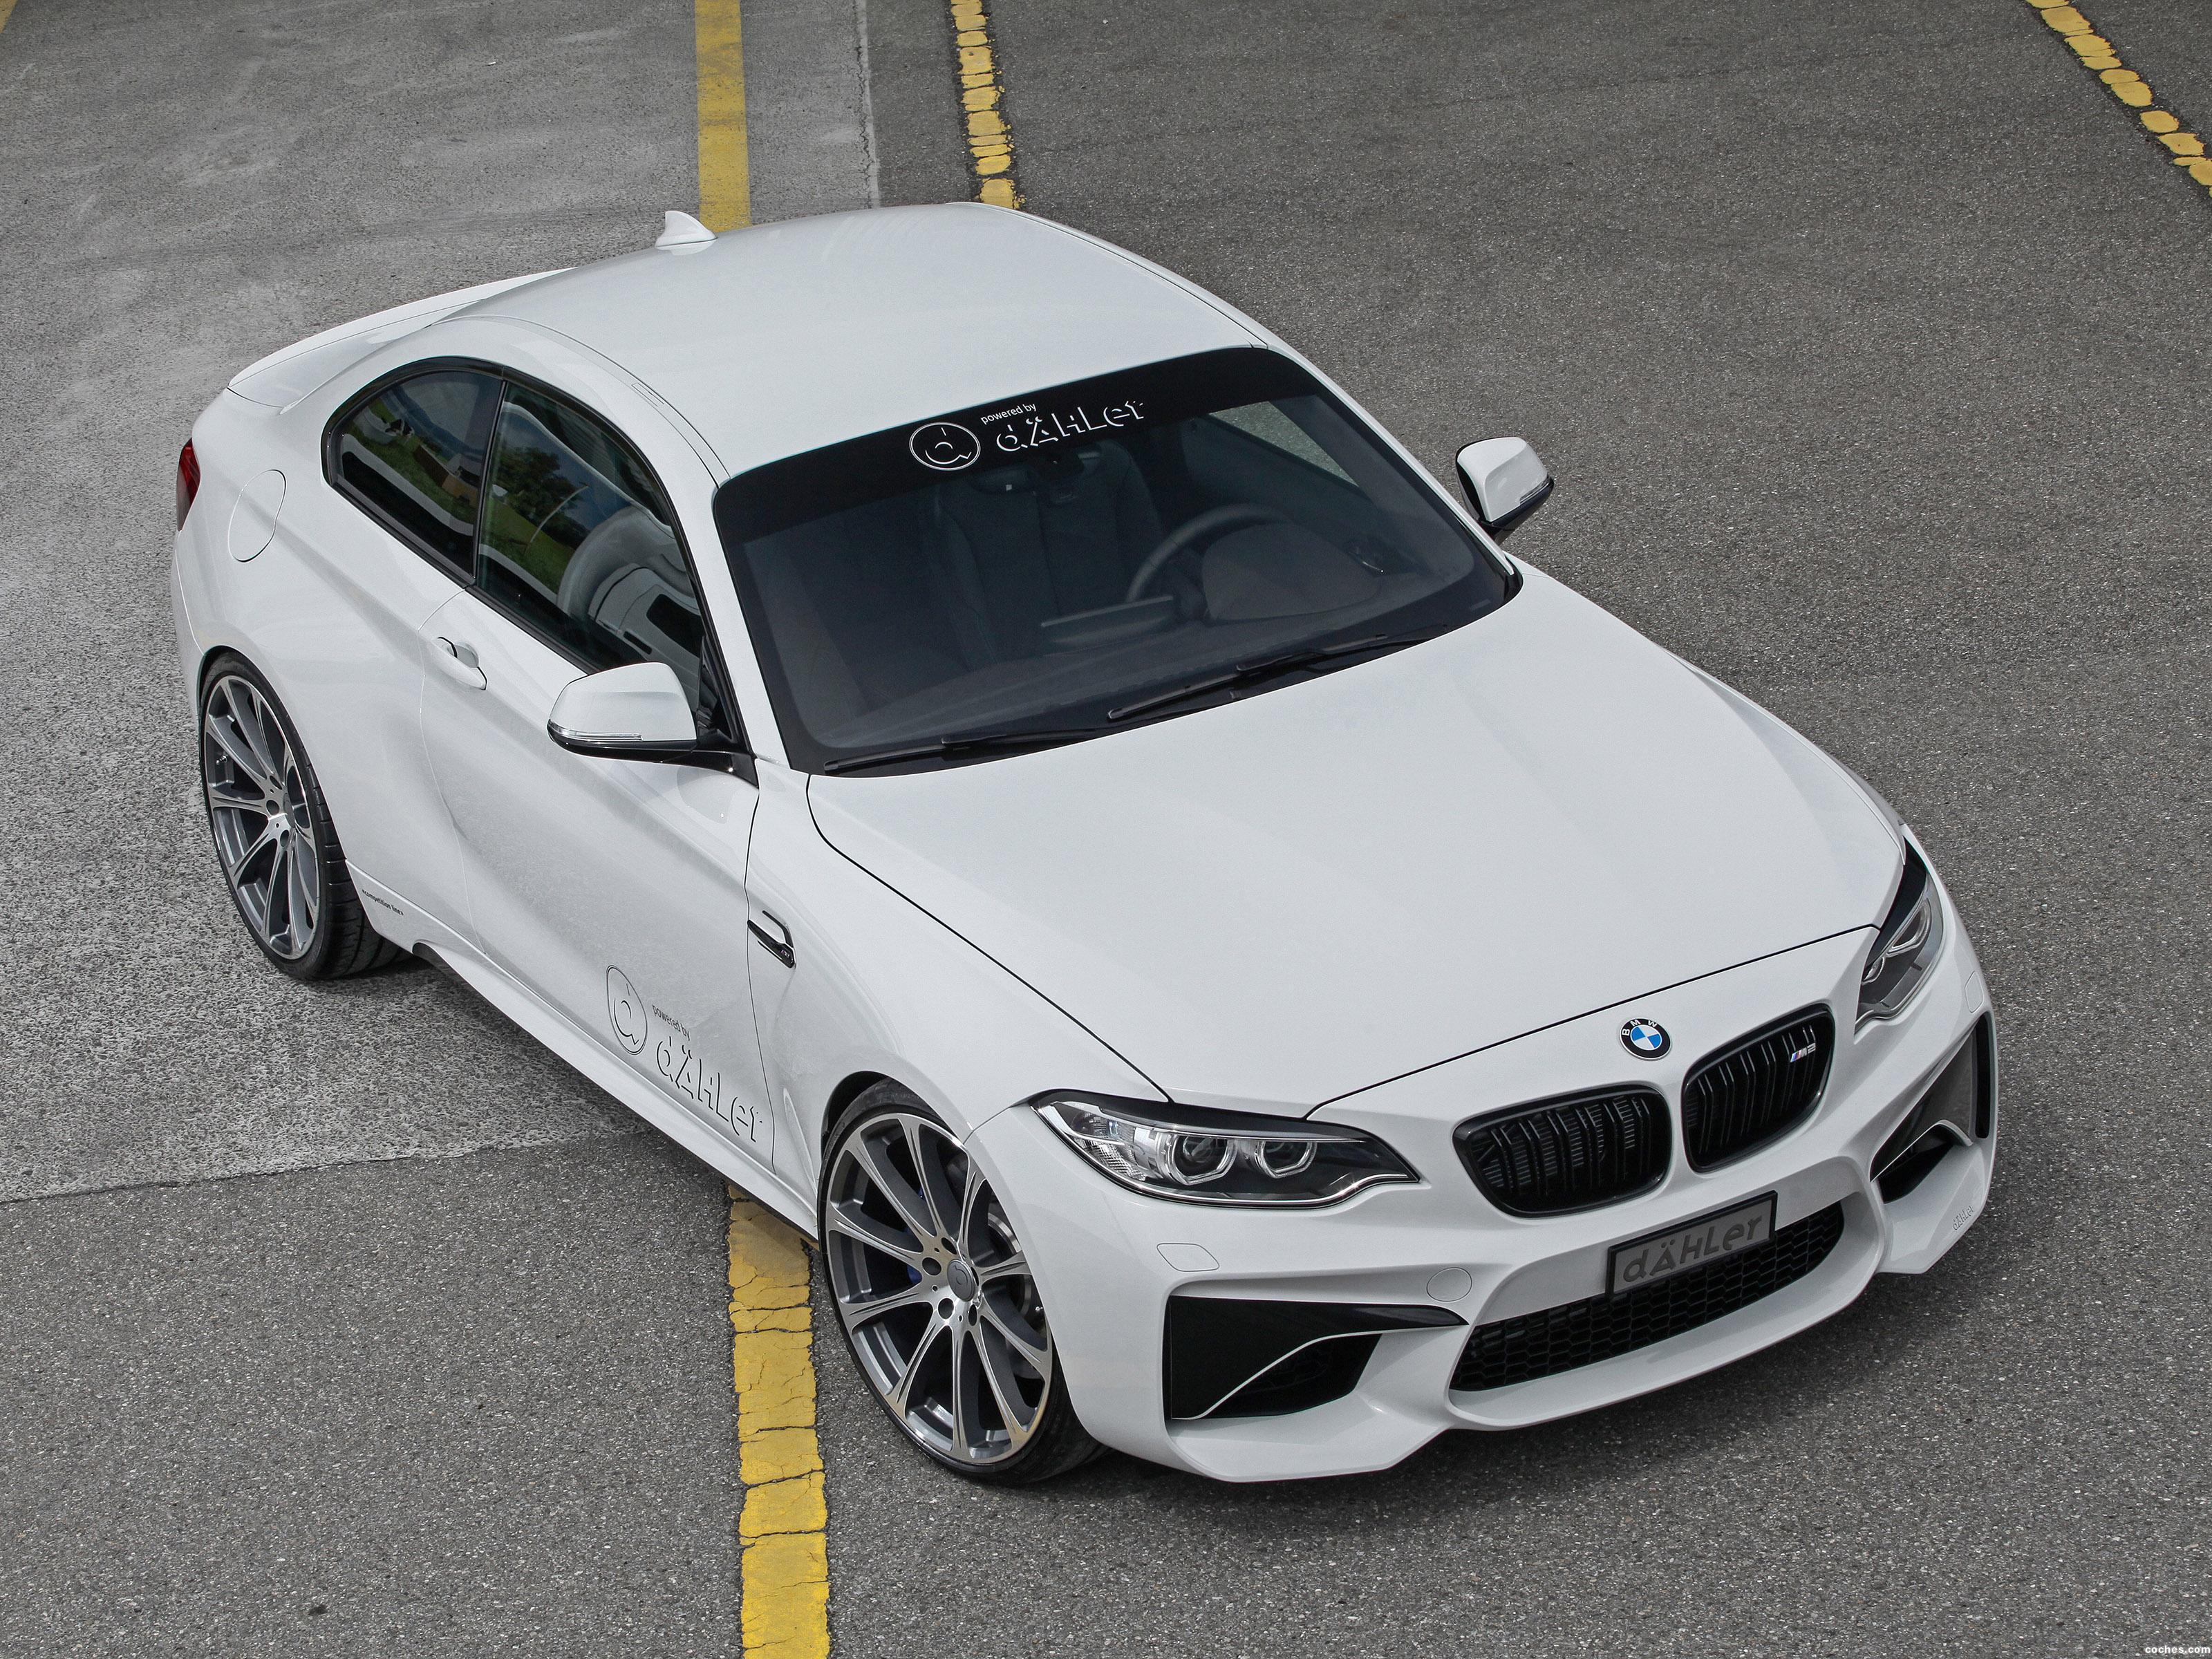 Foto 0 de Dahler BMW M2 F87 2016